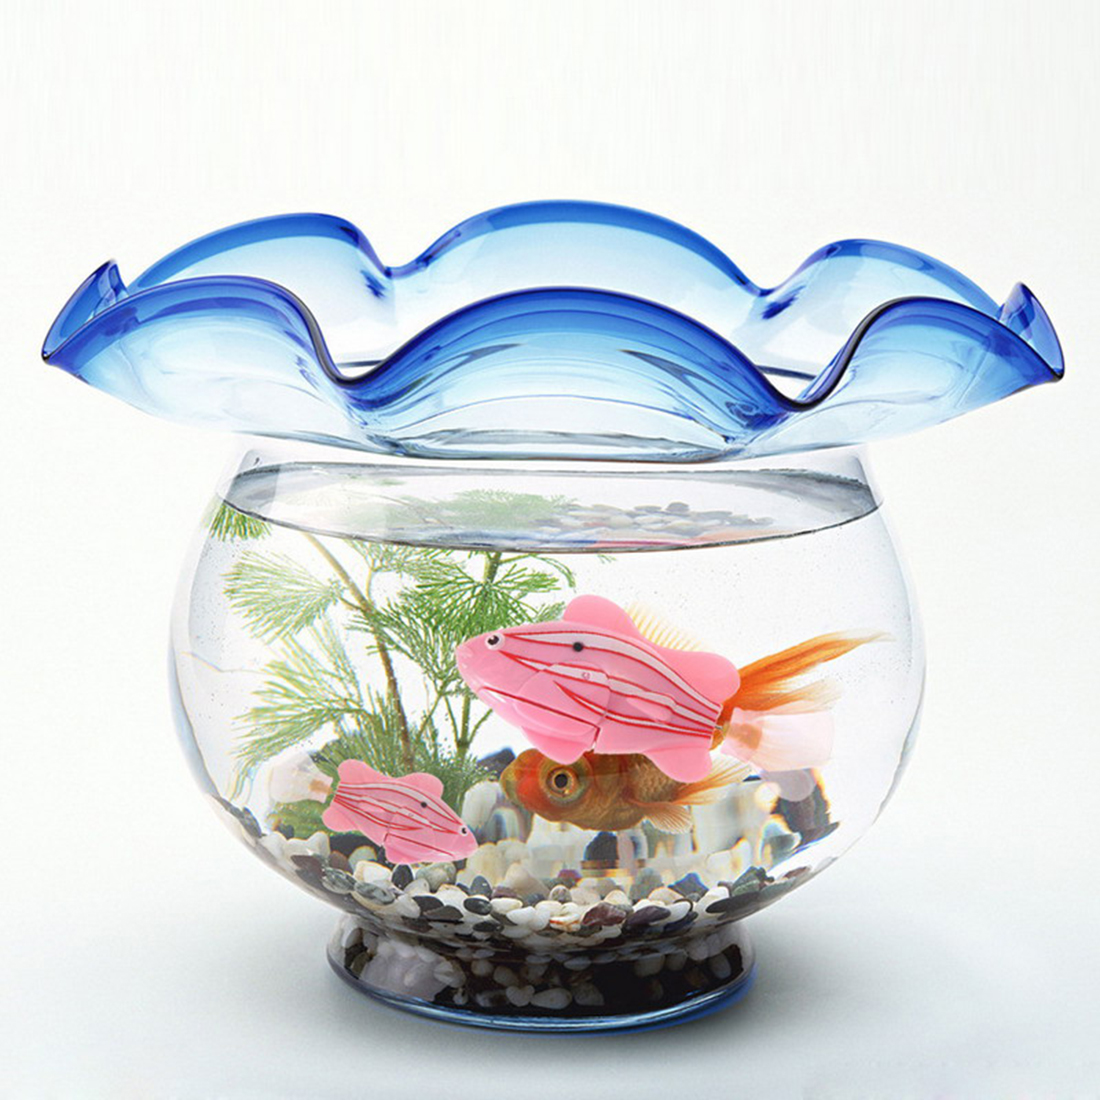 Fish tank toys - New Robofish Activated Battery Powered Robo Fish Toy Fish Robotic Fish Tank Aquarium Ornaments Decorations